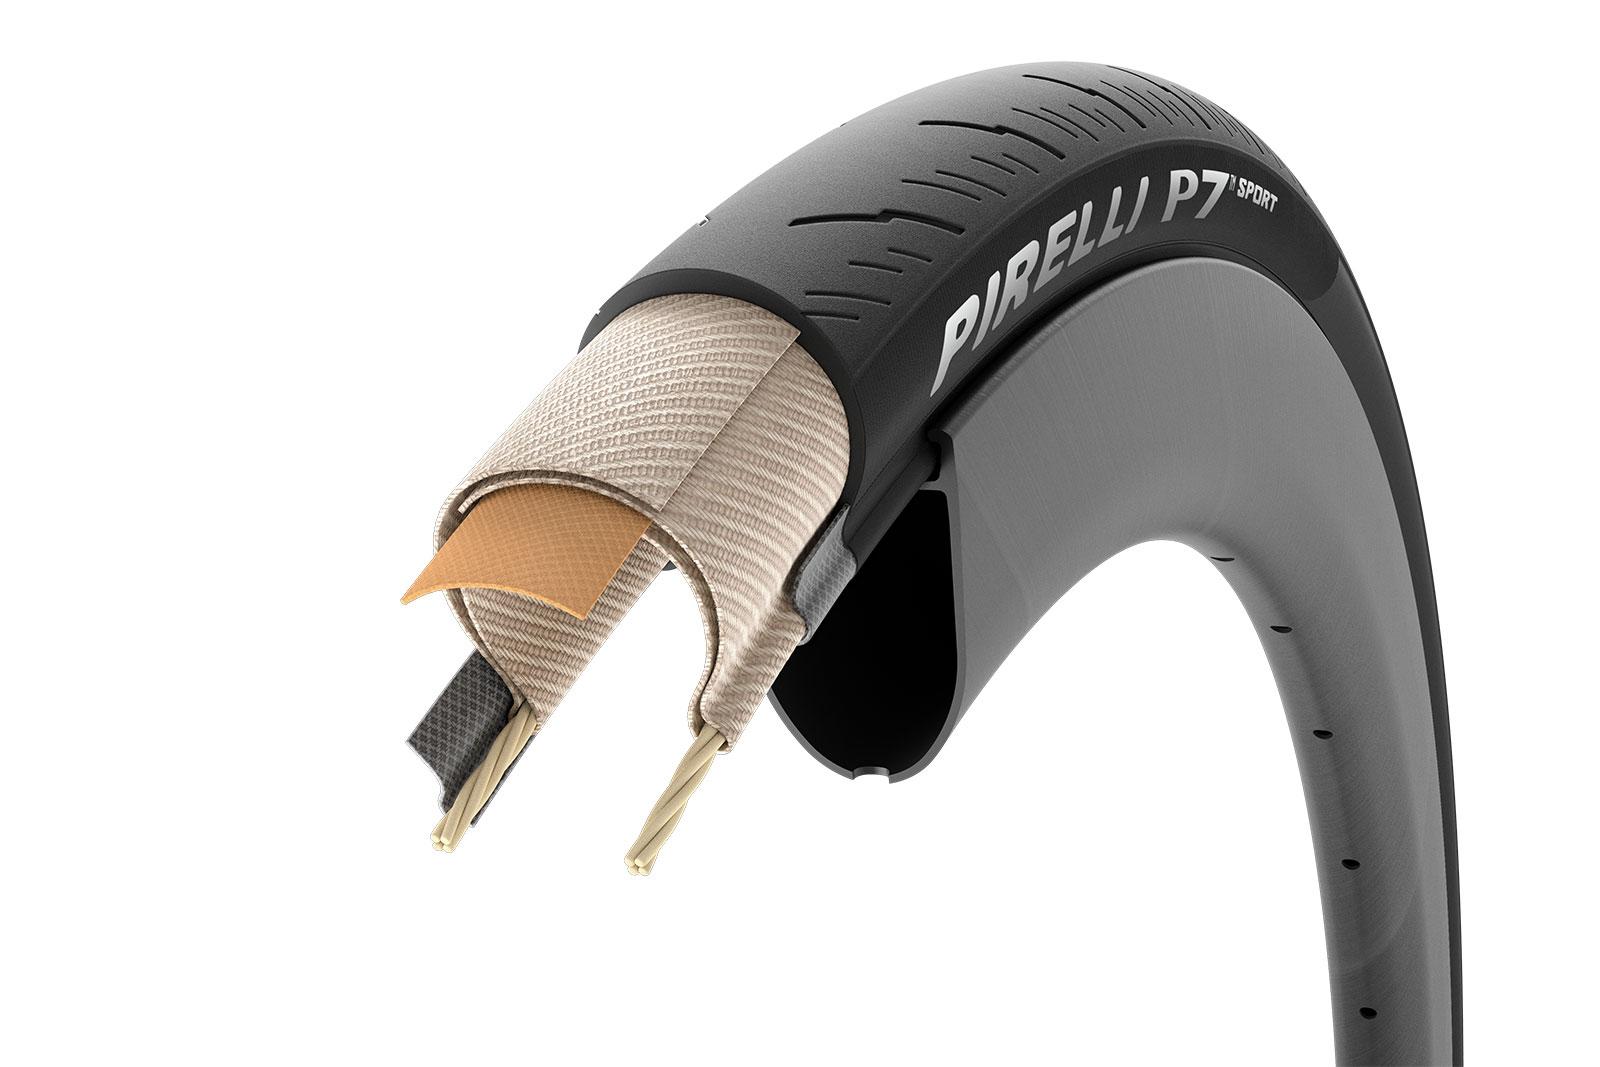 pirelli p7 sport all season road bike tire puncture proof casings layers cutaway